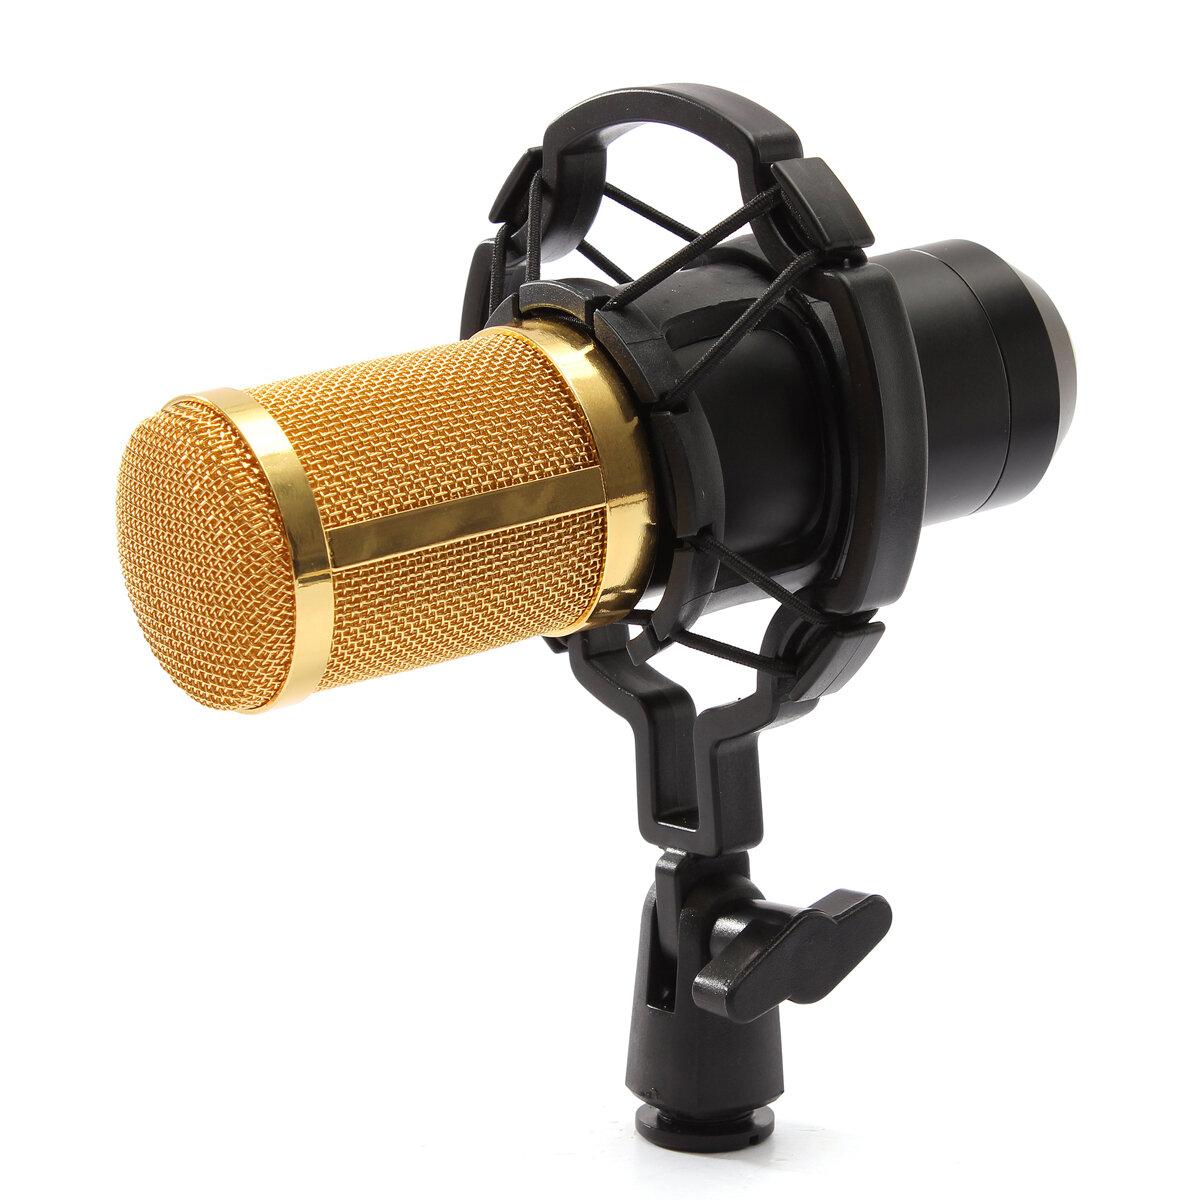 bm800 recording dynamic condenser microphone with shock mount us. Black Bedroom Furniture Sets. Home Design Ideas